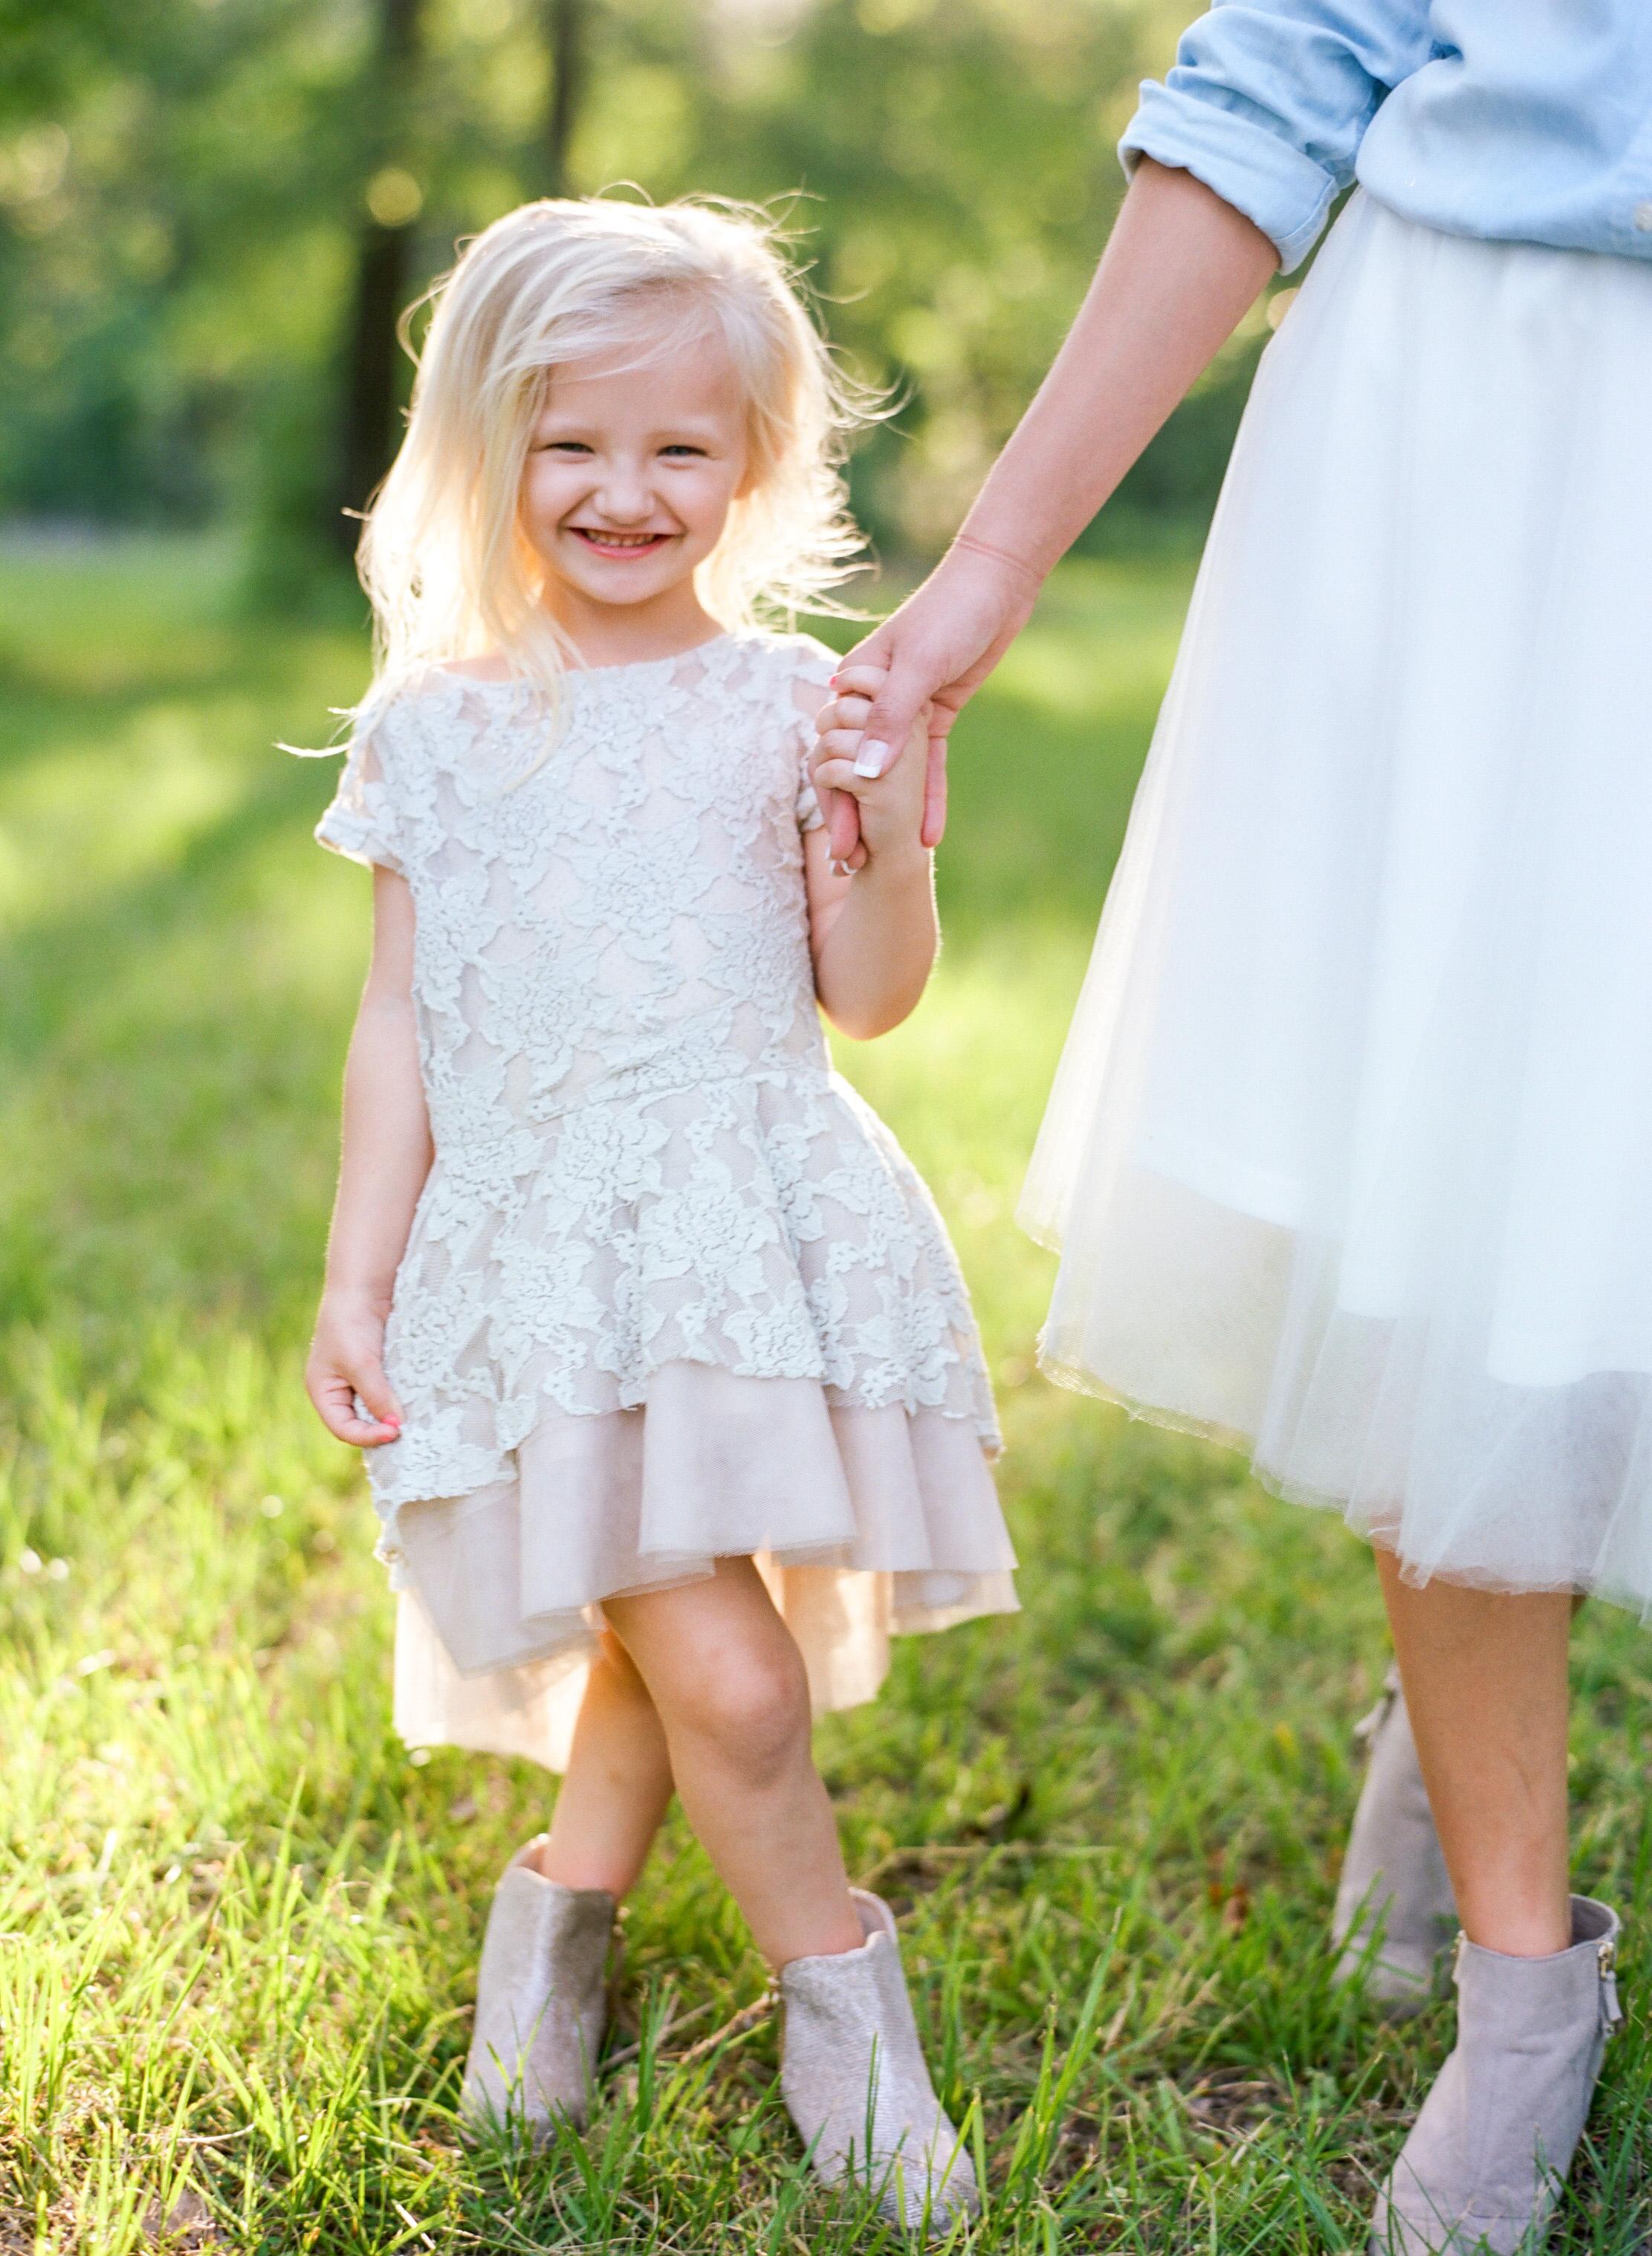 Dana-Fernandez-Photography-Houston-Portrait-Photographer-Film-Children-Family-Maternity-Senior-Photographer-17.jpg